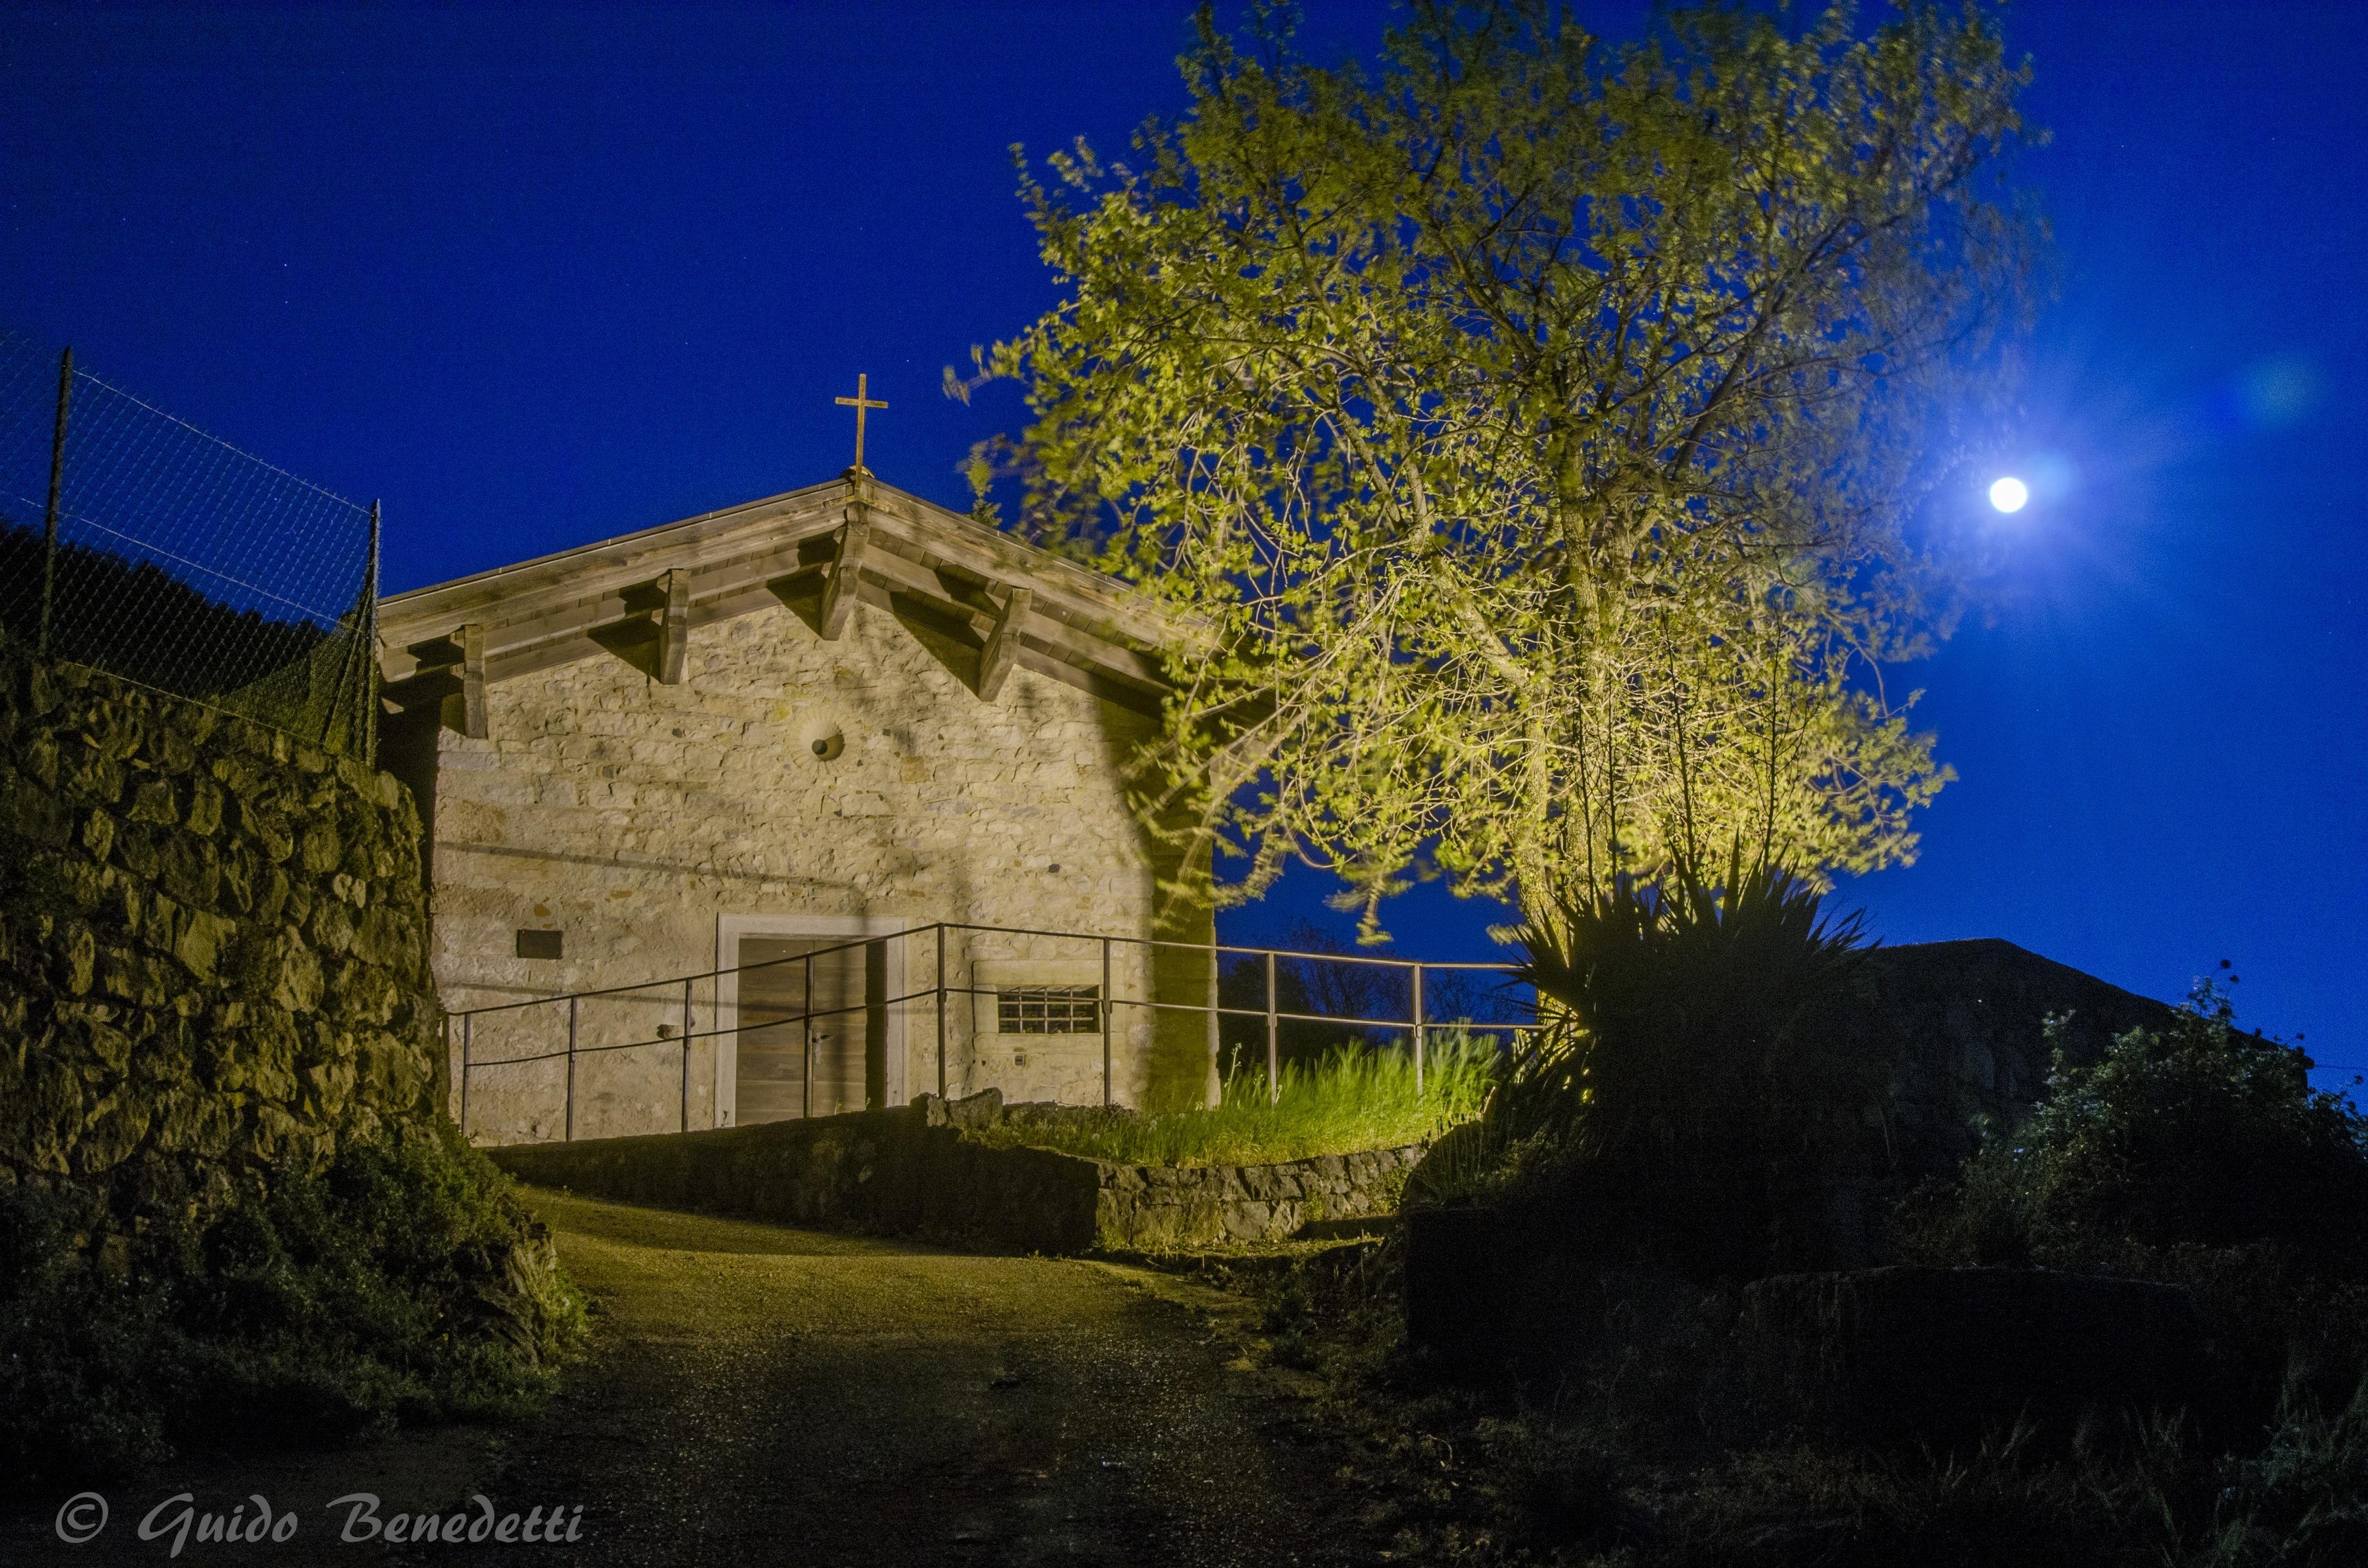 Chiesa di San Tomé di Gardumo a Pannone in Val di Gresta (Comune di Mori)